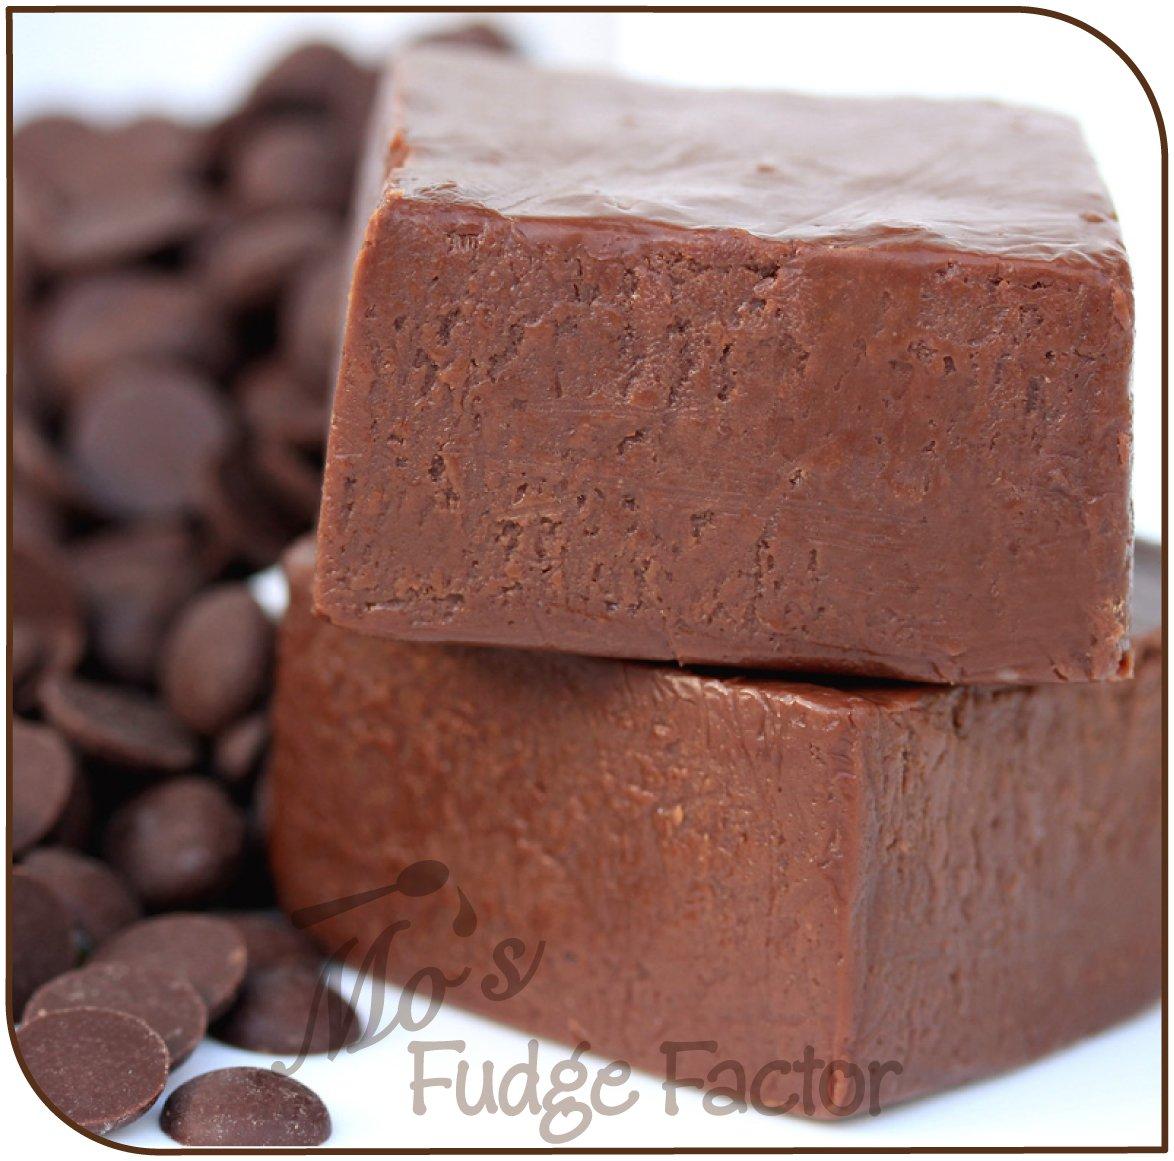 Mo's Fudge Factor, Chocolate Fudge 2 pounds